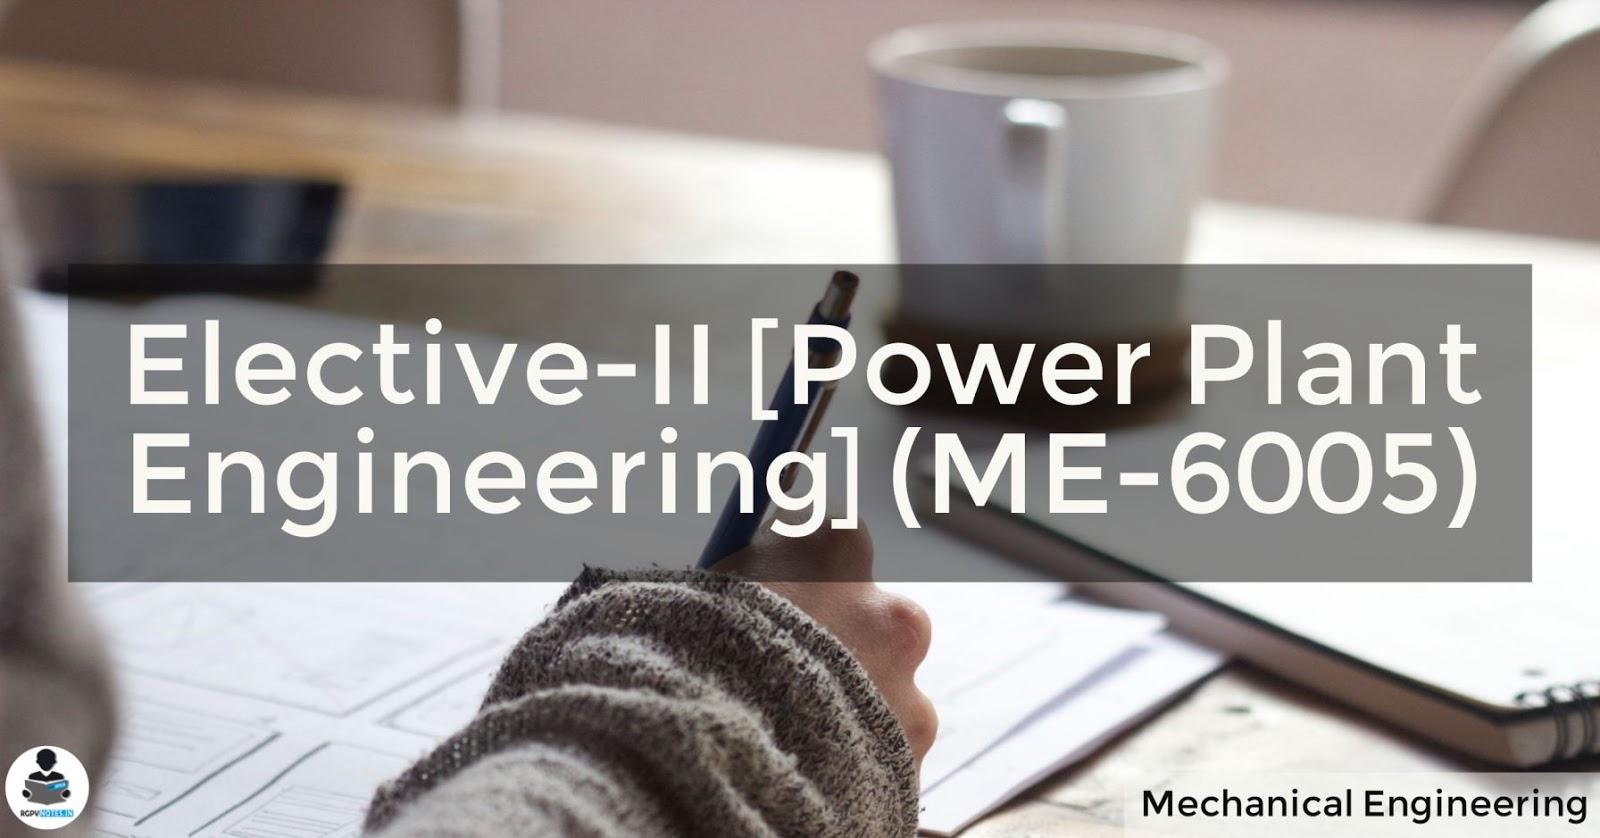 Power Plant Engineering (ME-6005)